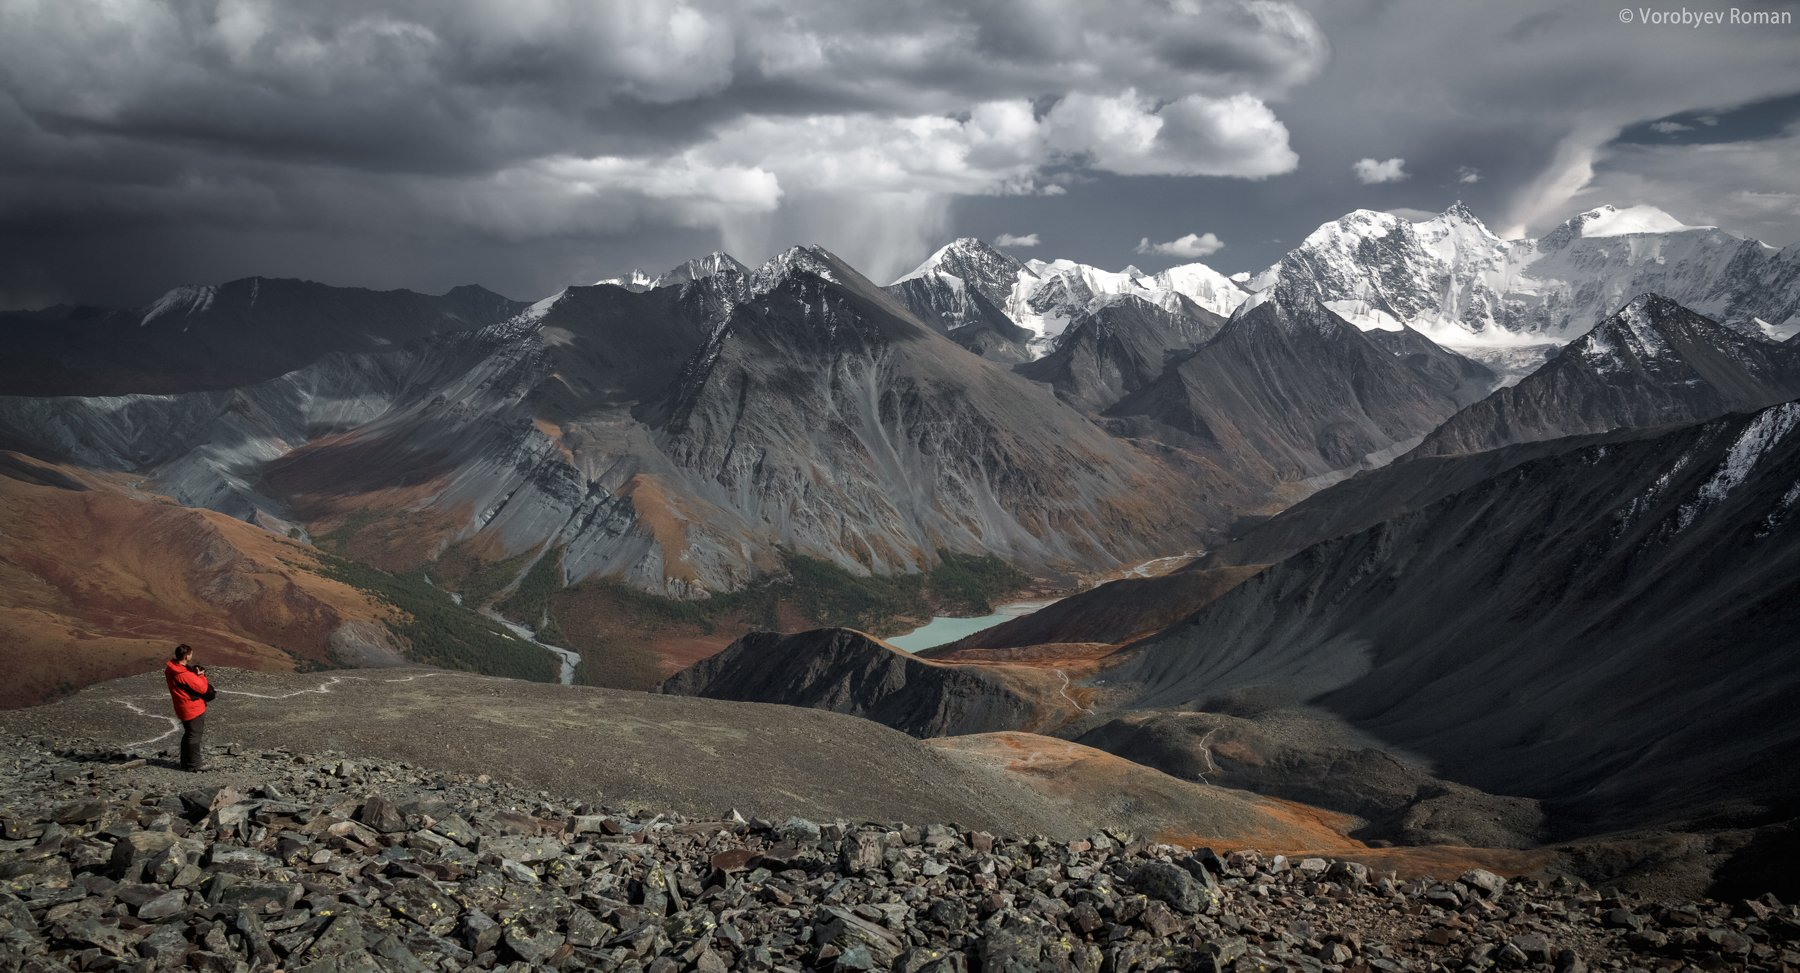 алтай, горы, снег, первый снег, горный алтай, осень, белуха, Roman Vorobyev